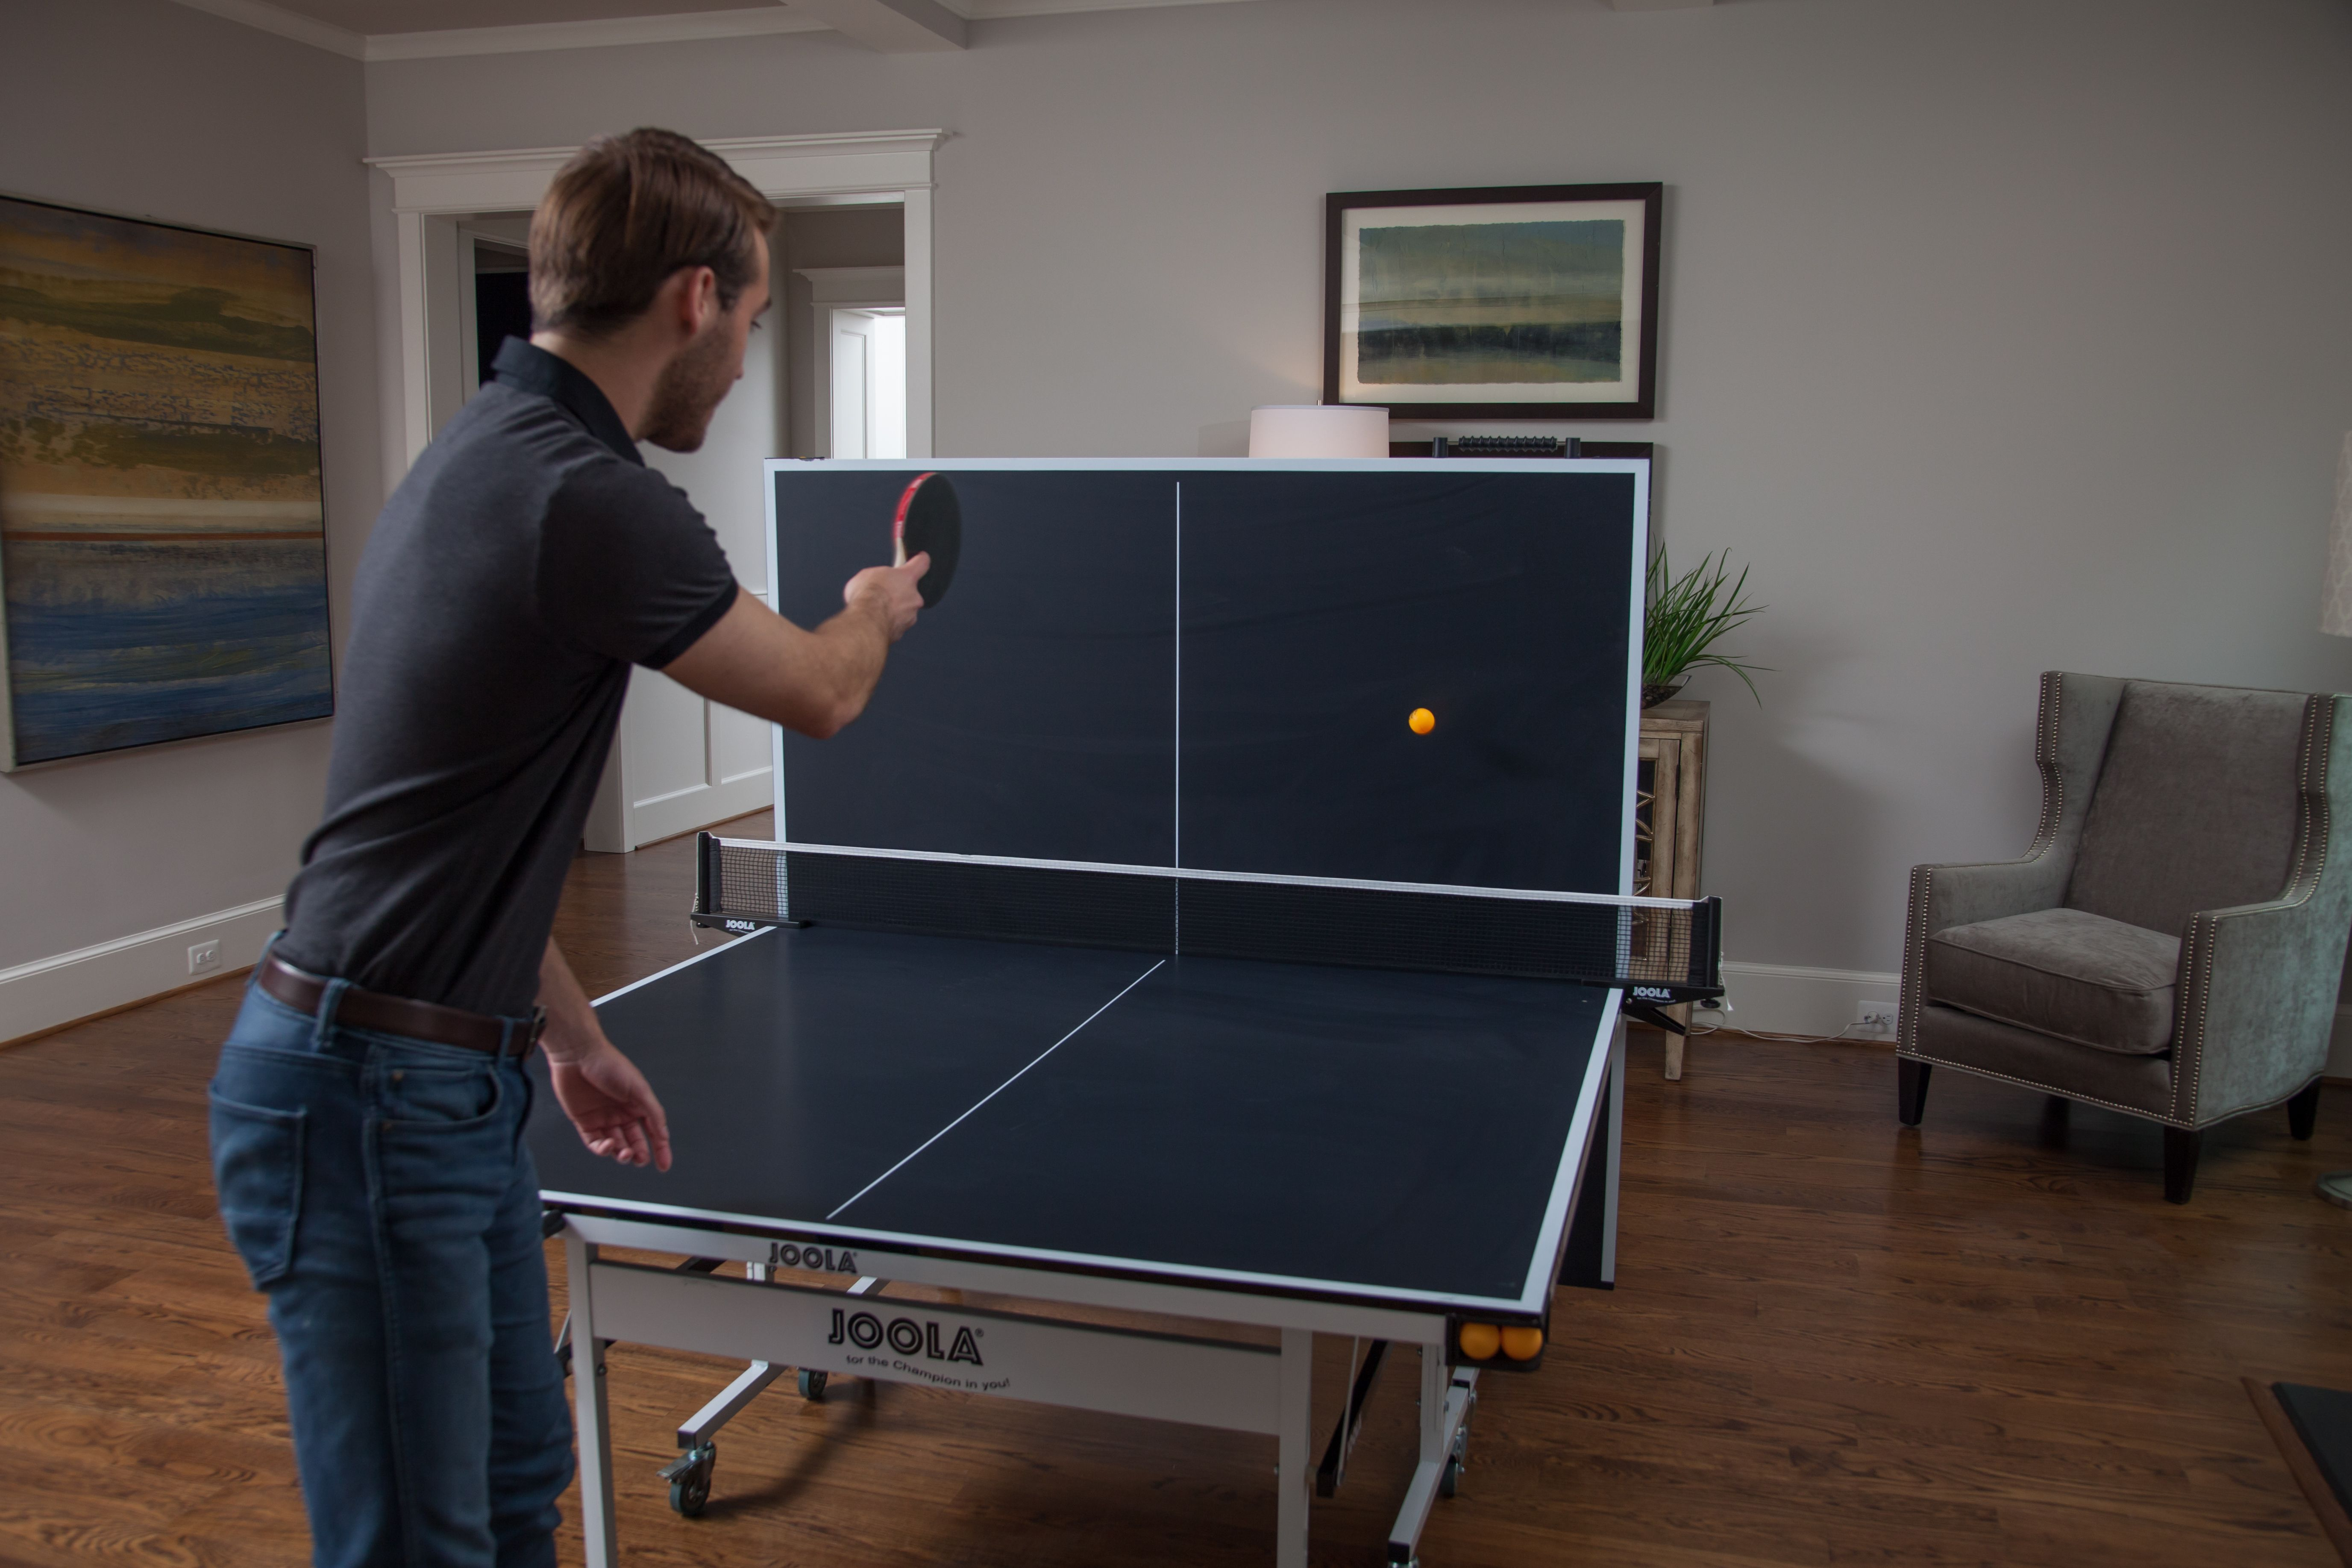 Joola Rapid Play 150 Table Tennis Table 15mm Joola Table Tennis Table Black And White Design